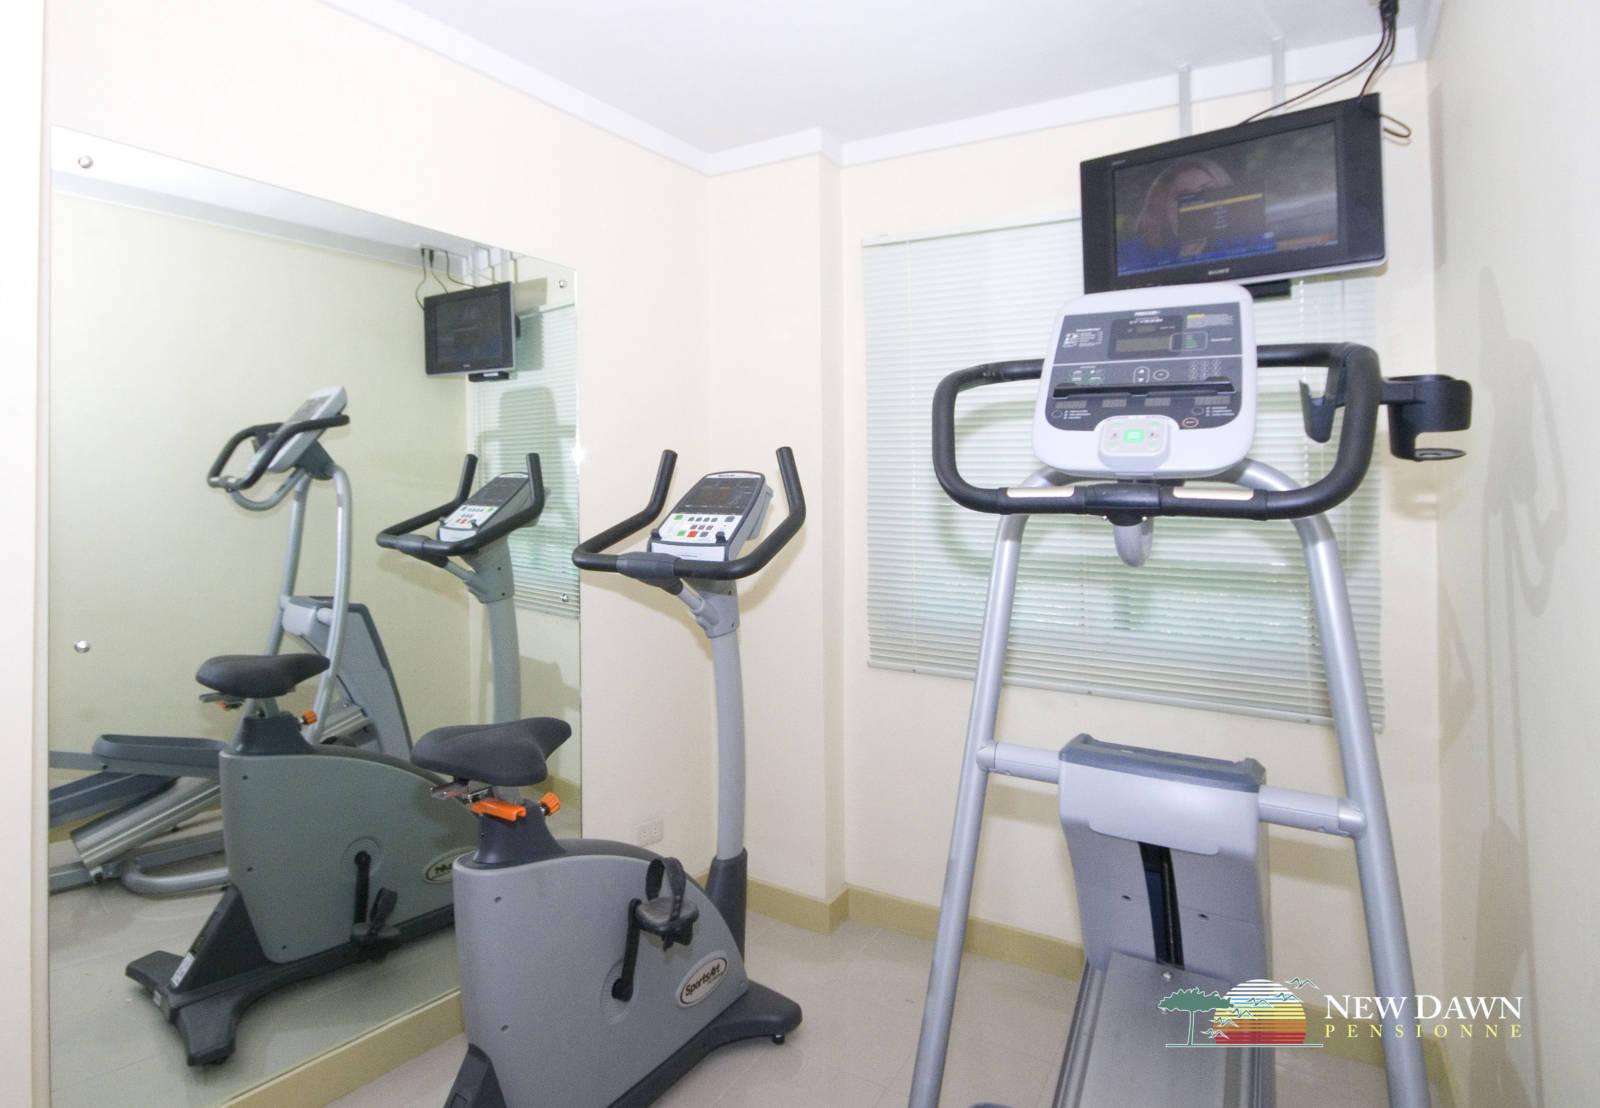 Mini gym new dawn pensionne